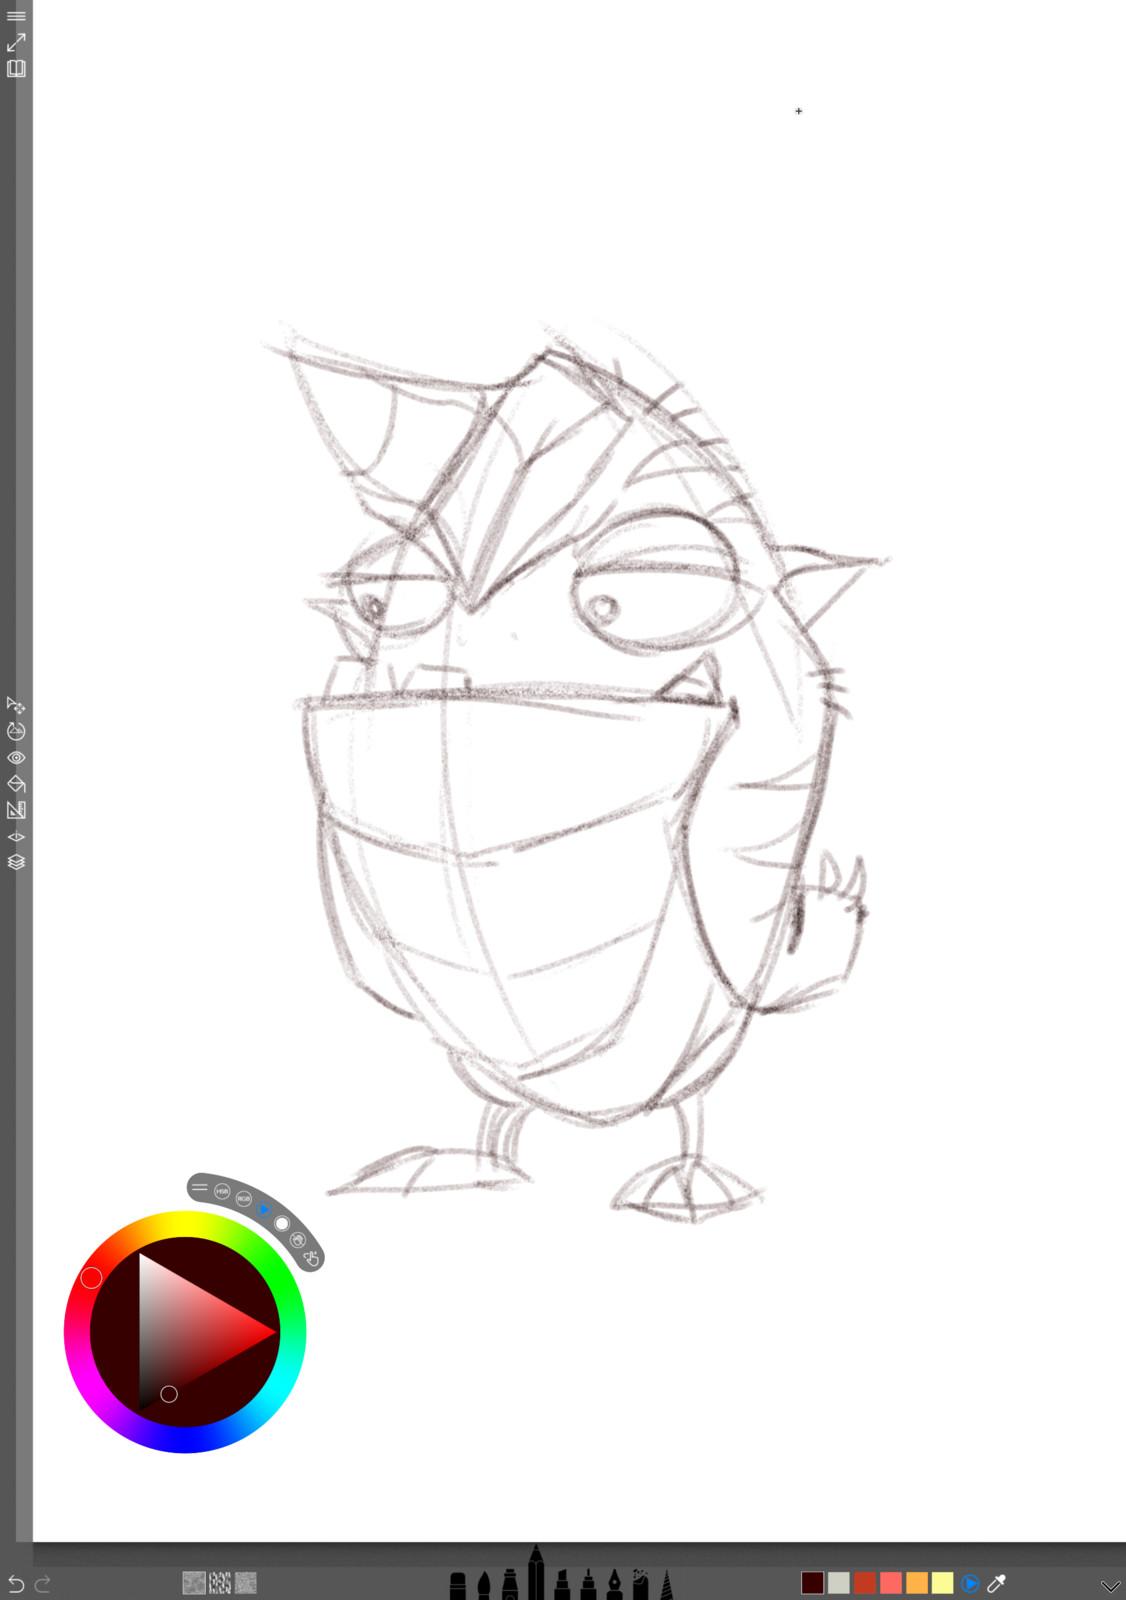 01 - Initial concept sketch